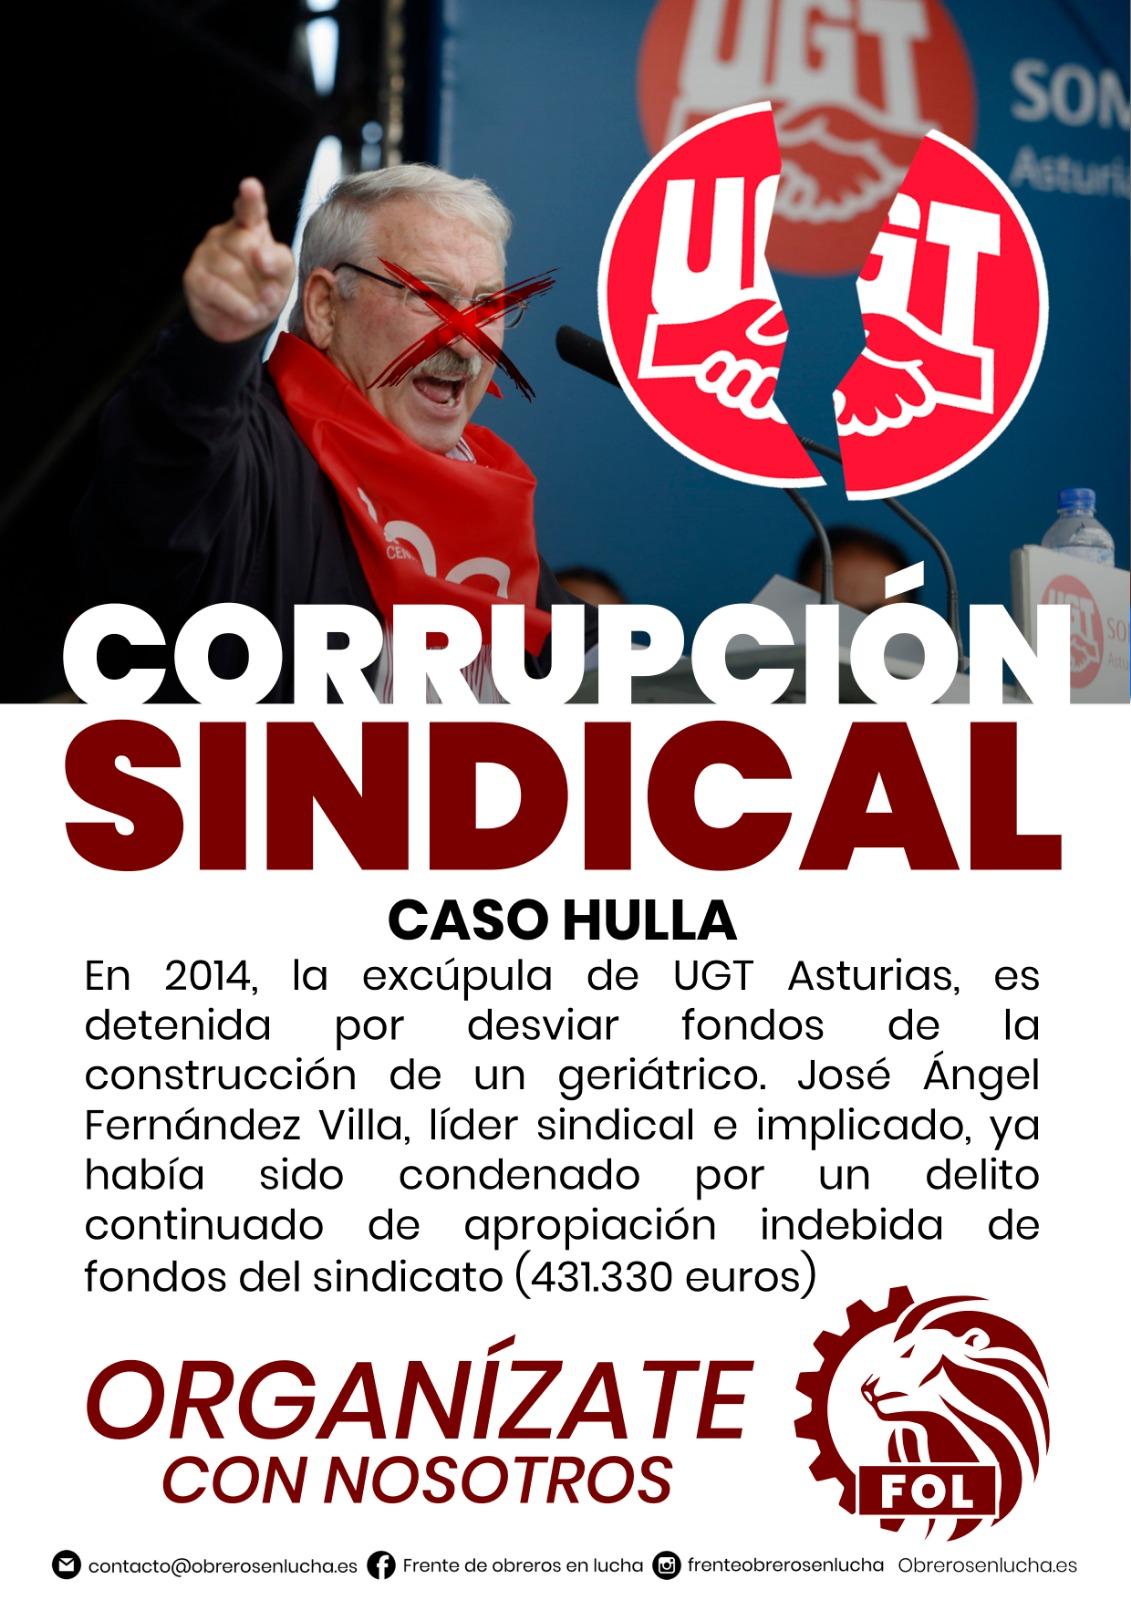 CORRUPCIÓN SINDICAL- CASO HULLA